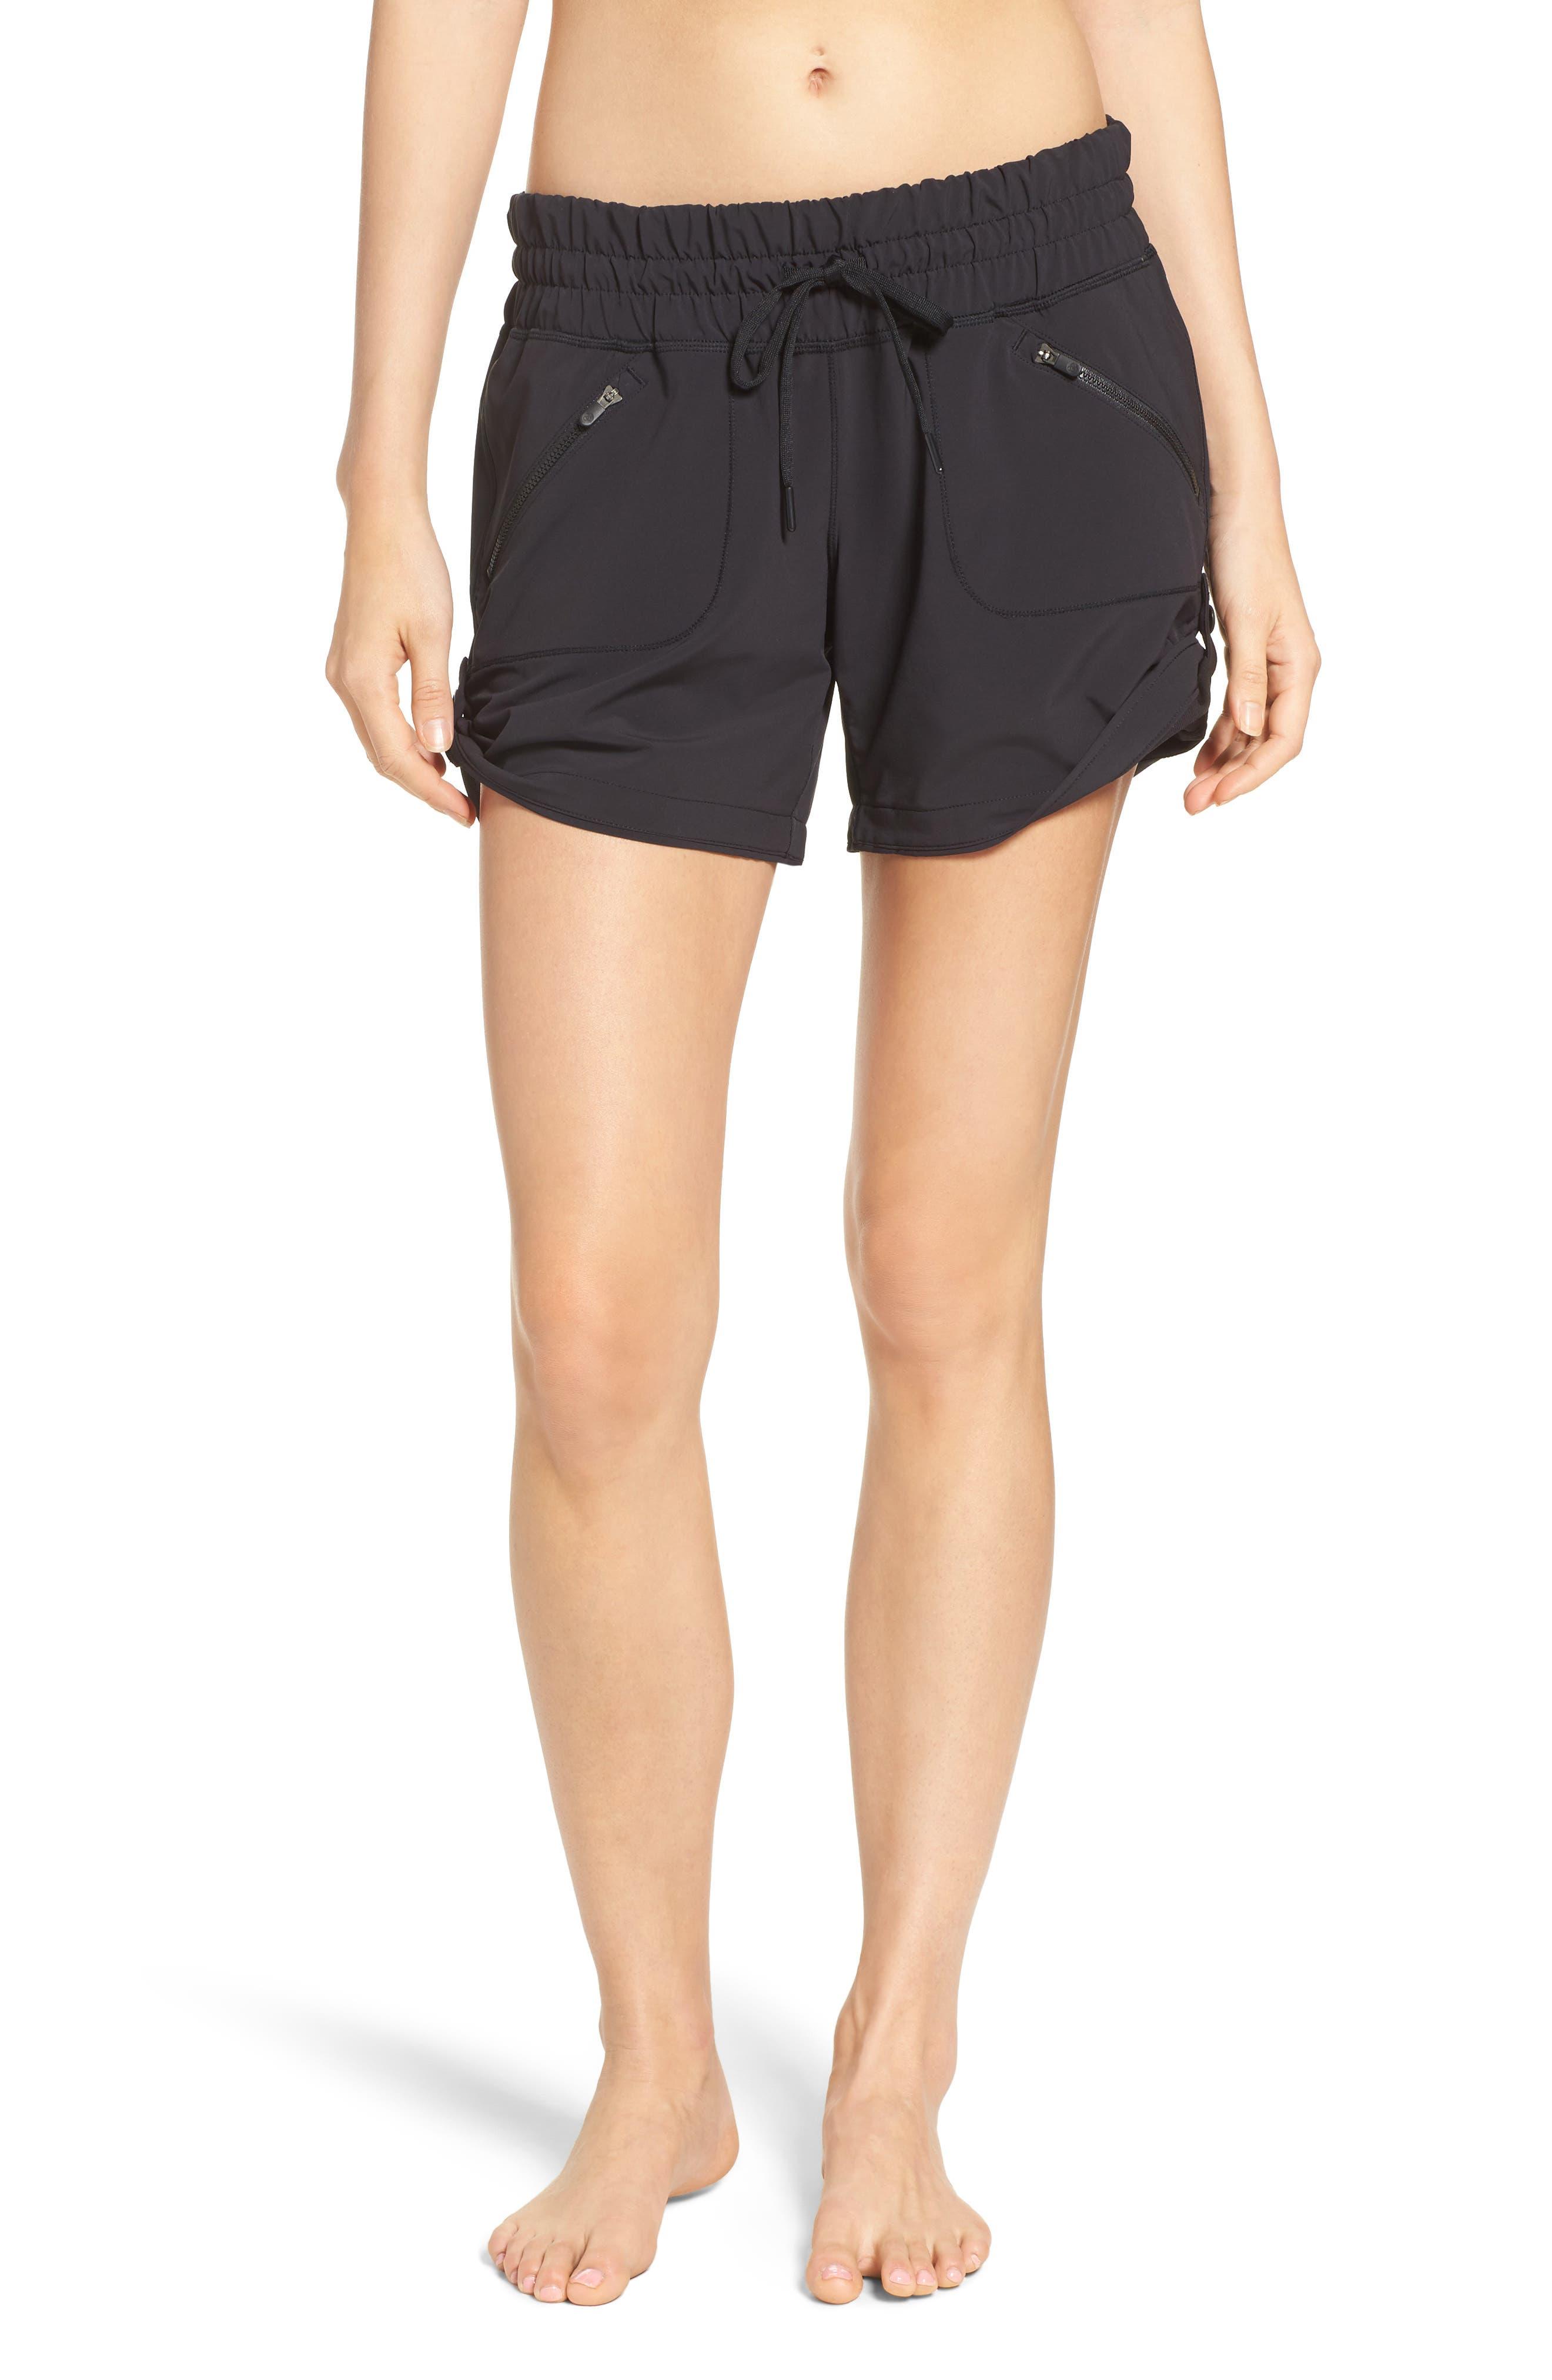 ZELLA, Switchback Shorts, Main thumbnail 1, color, BLACK